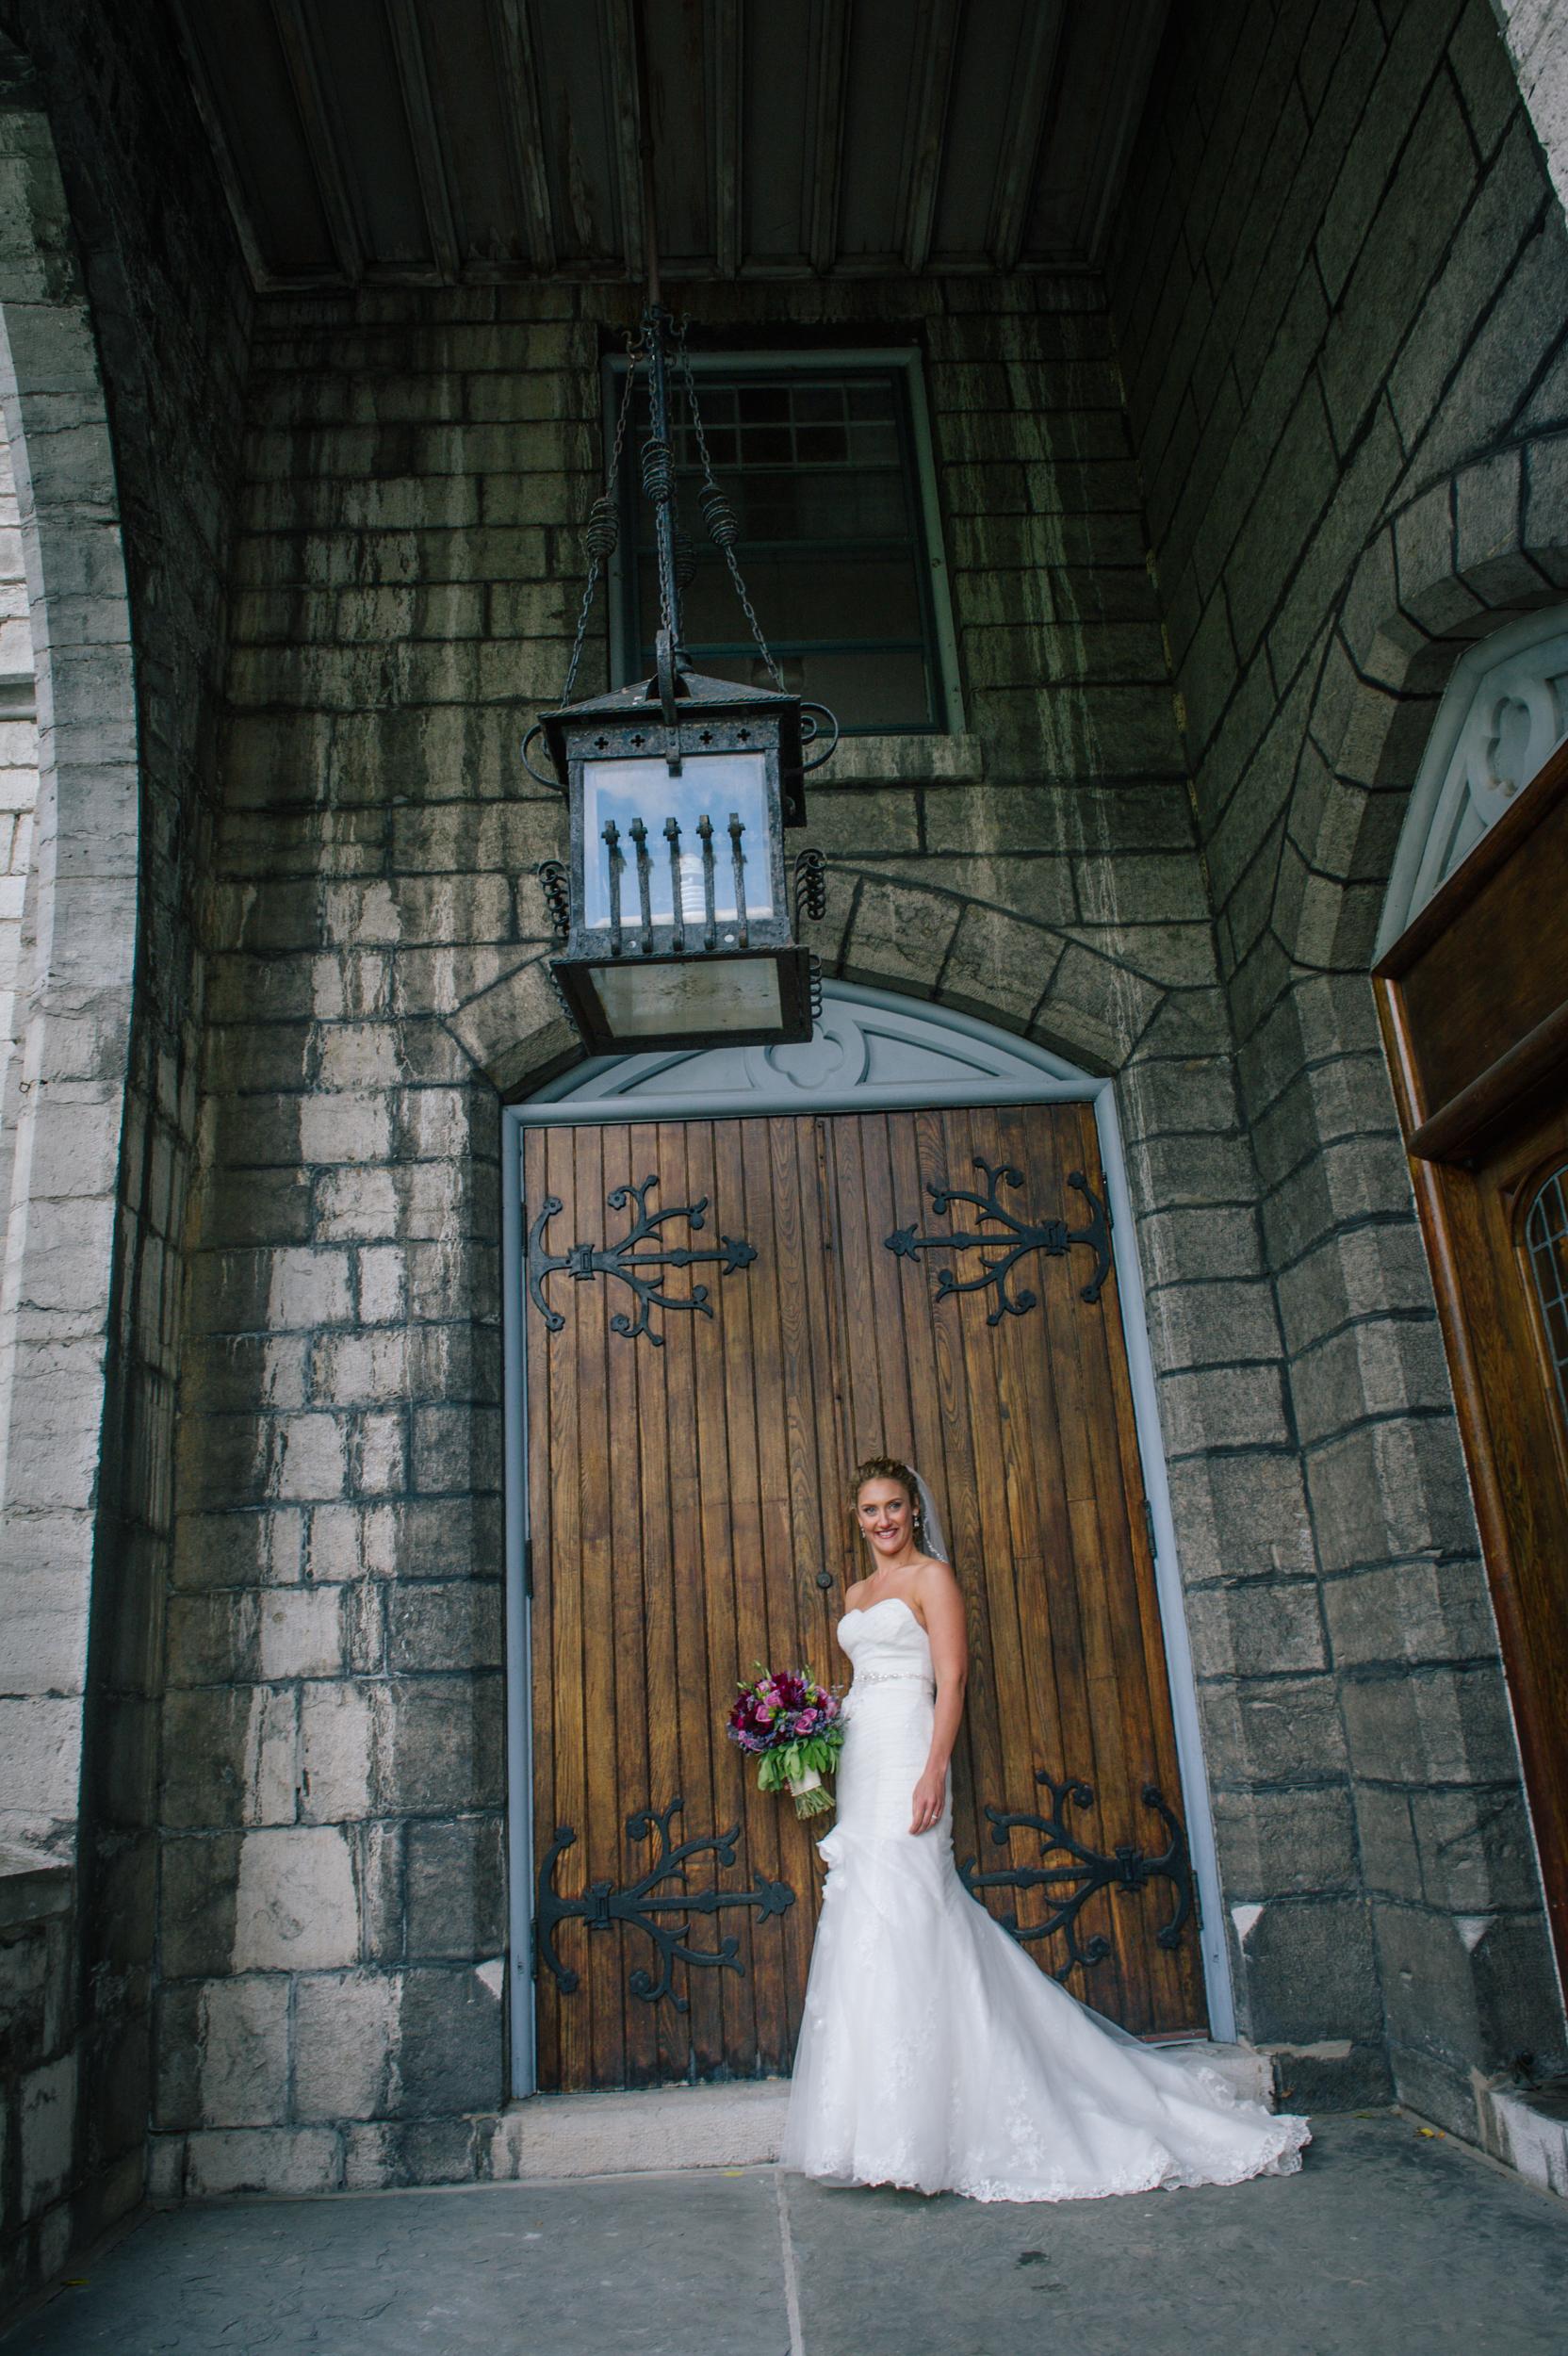 JKP-Destination-Weddings-0088.JPG